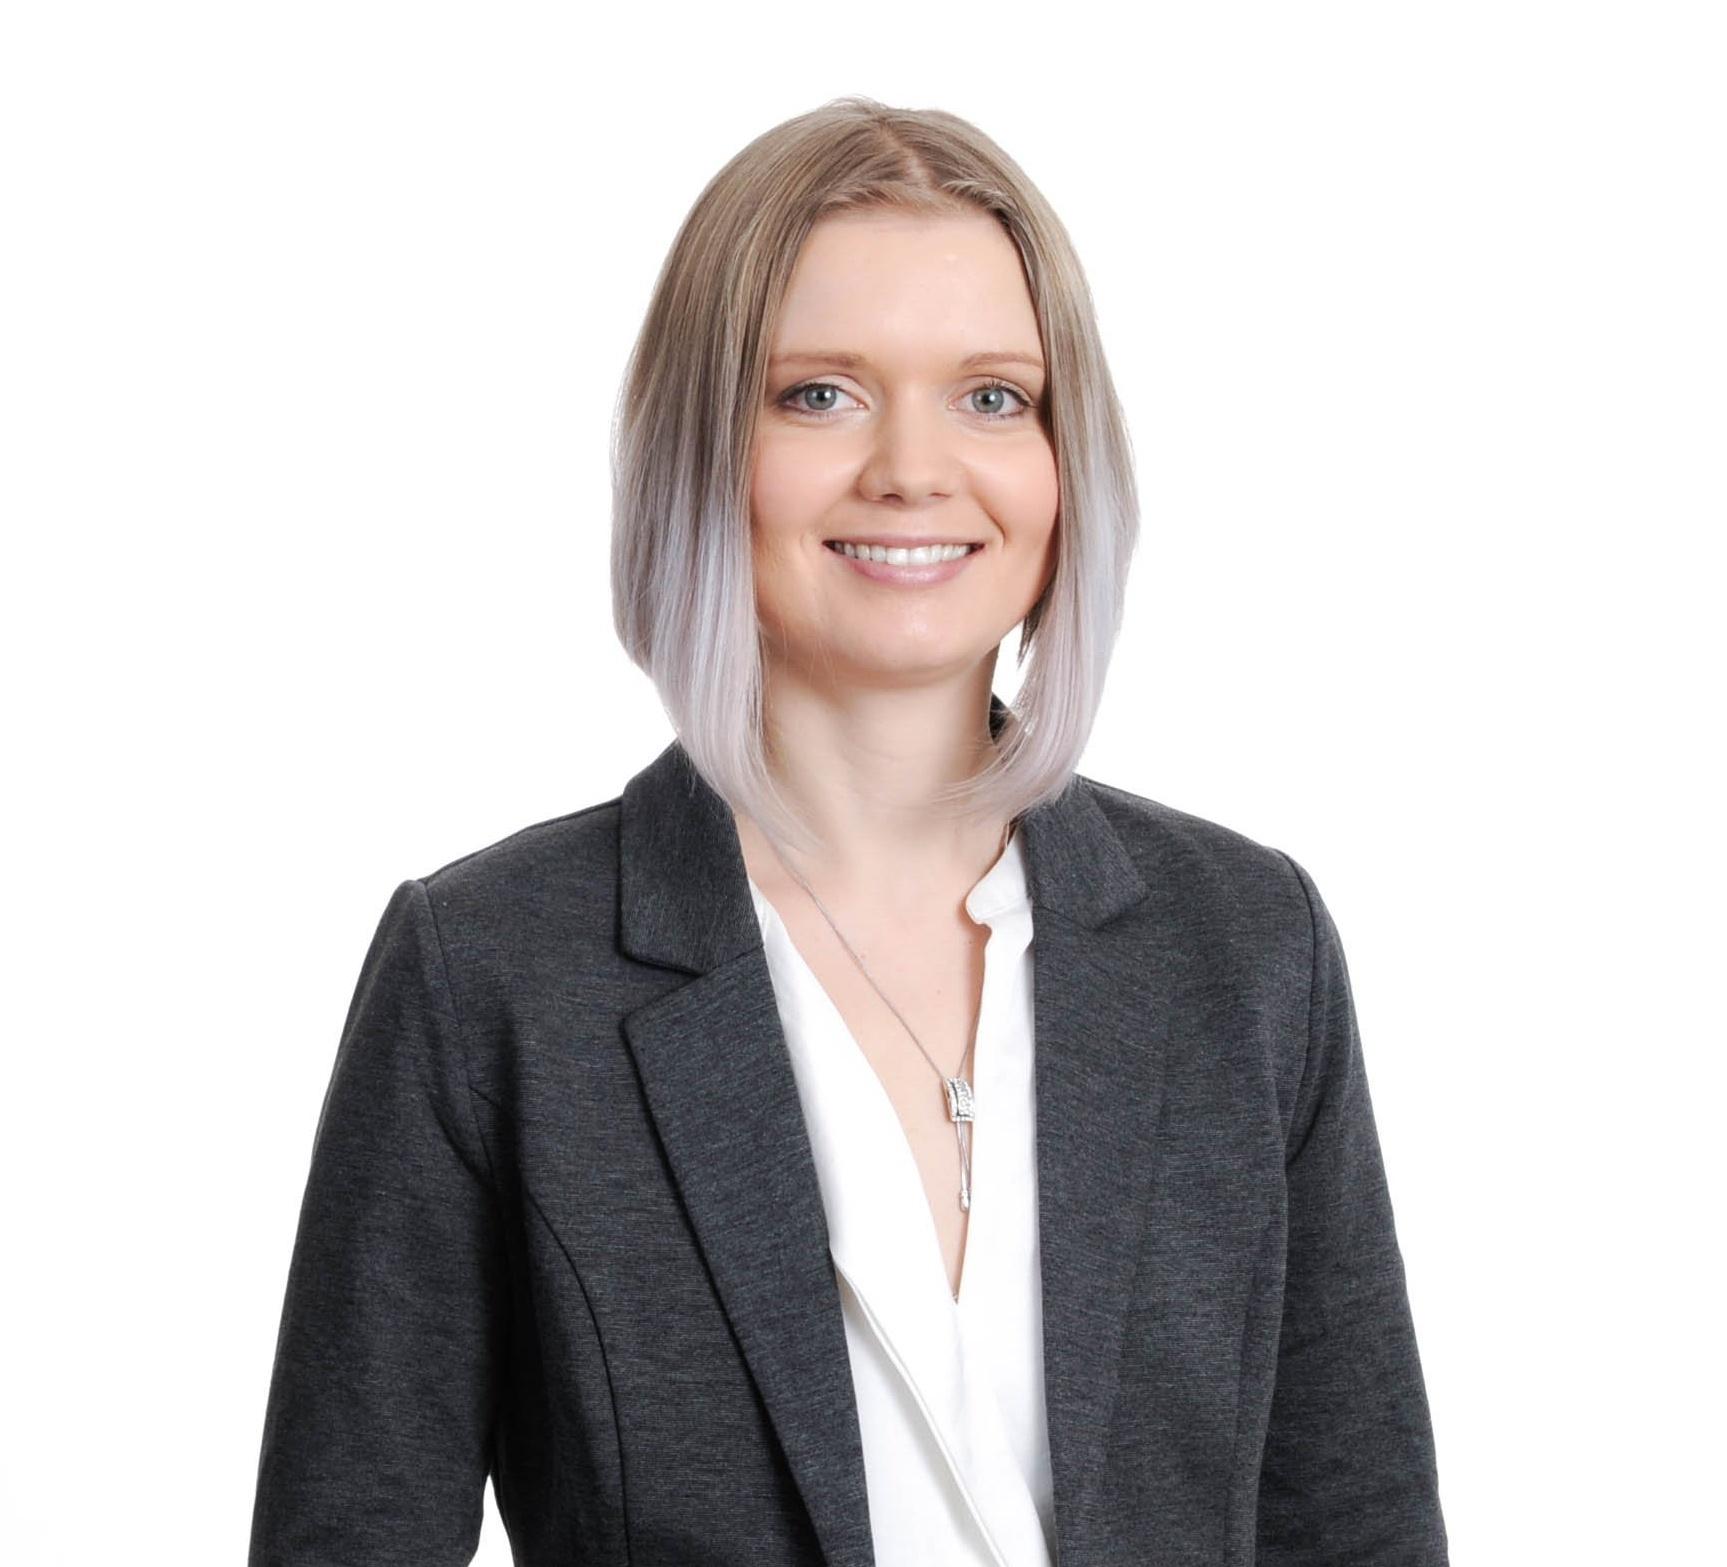 Katja Abramova's photo